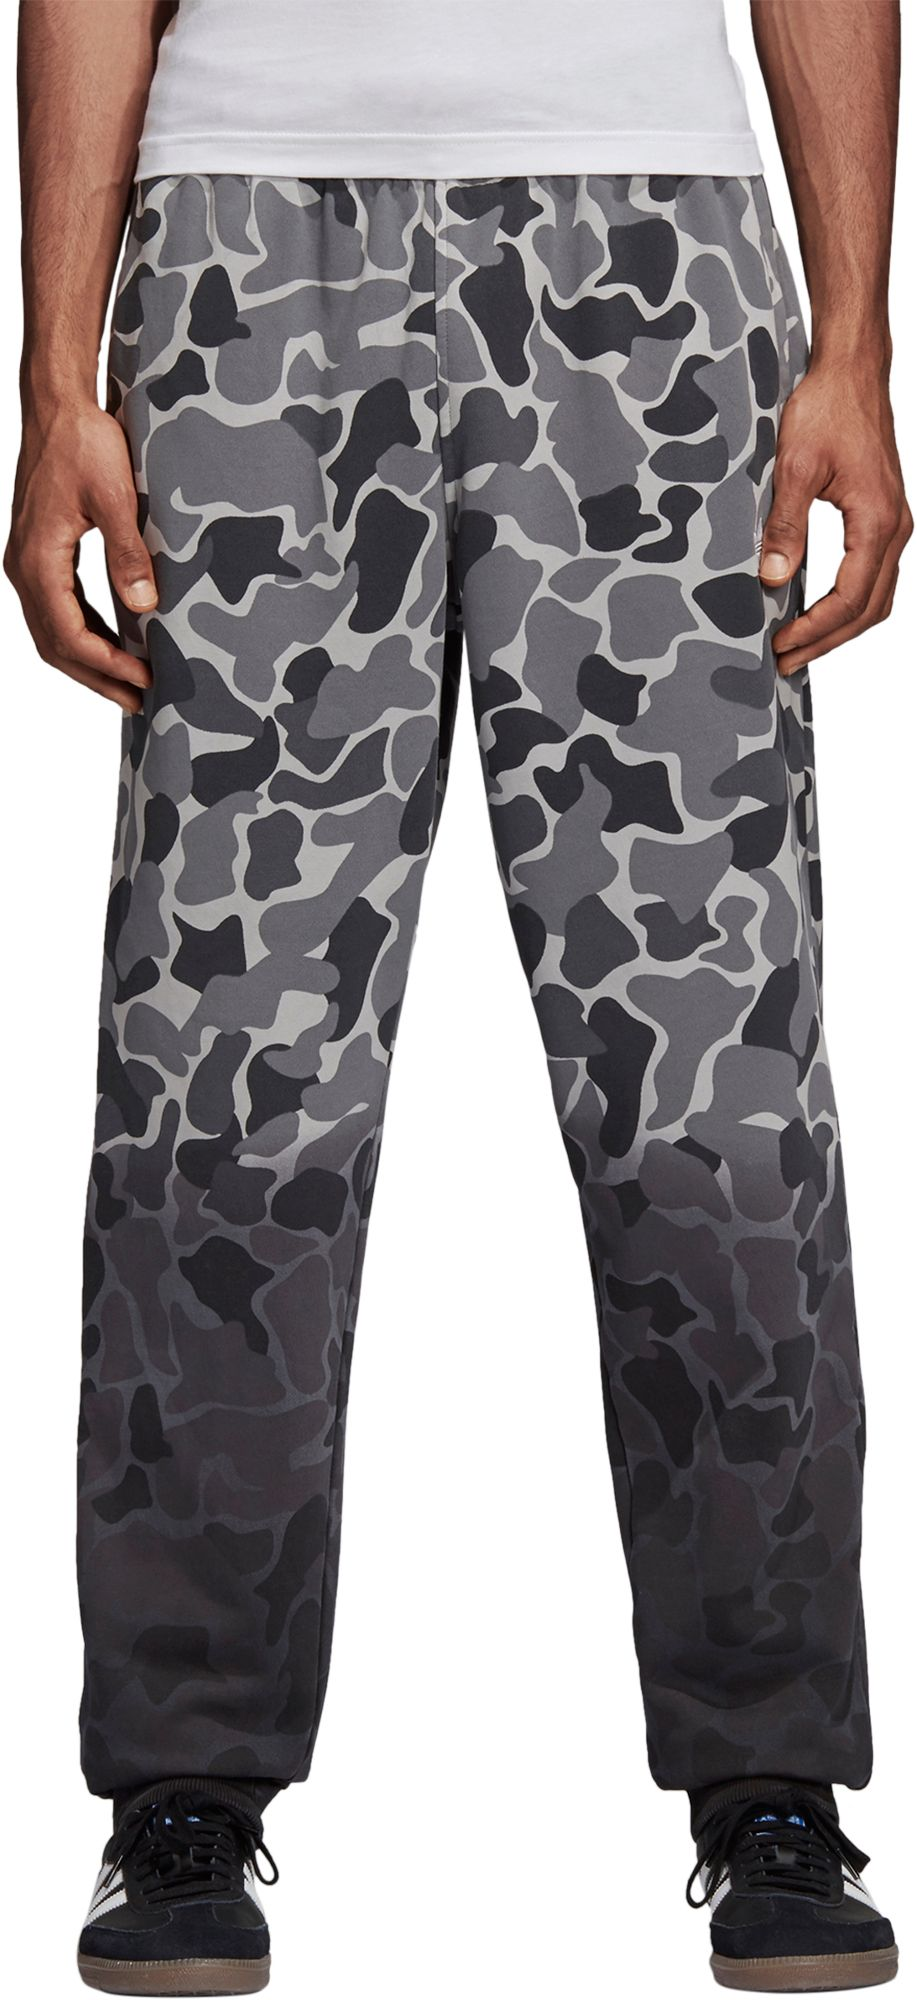 adidas Originals Men's Camo (Green) Dipped Pants, Size: Medium thumbnail